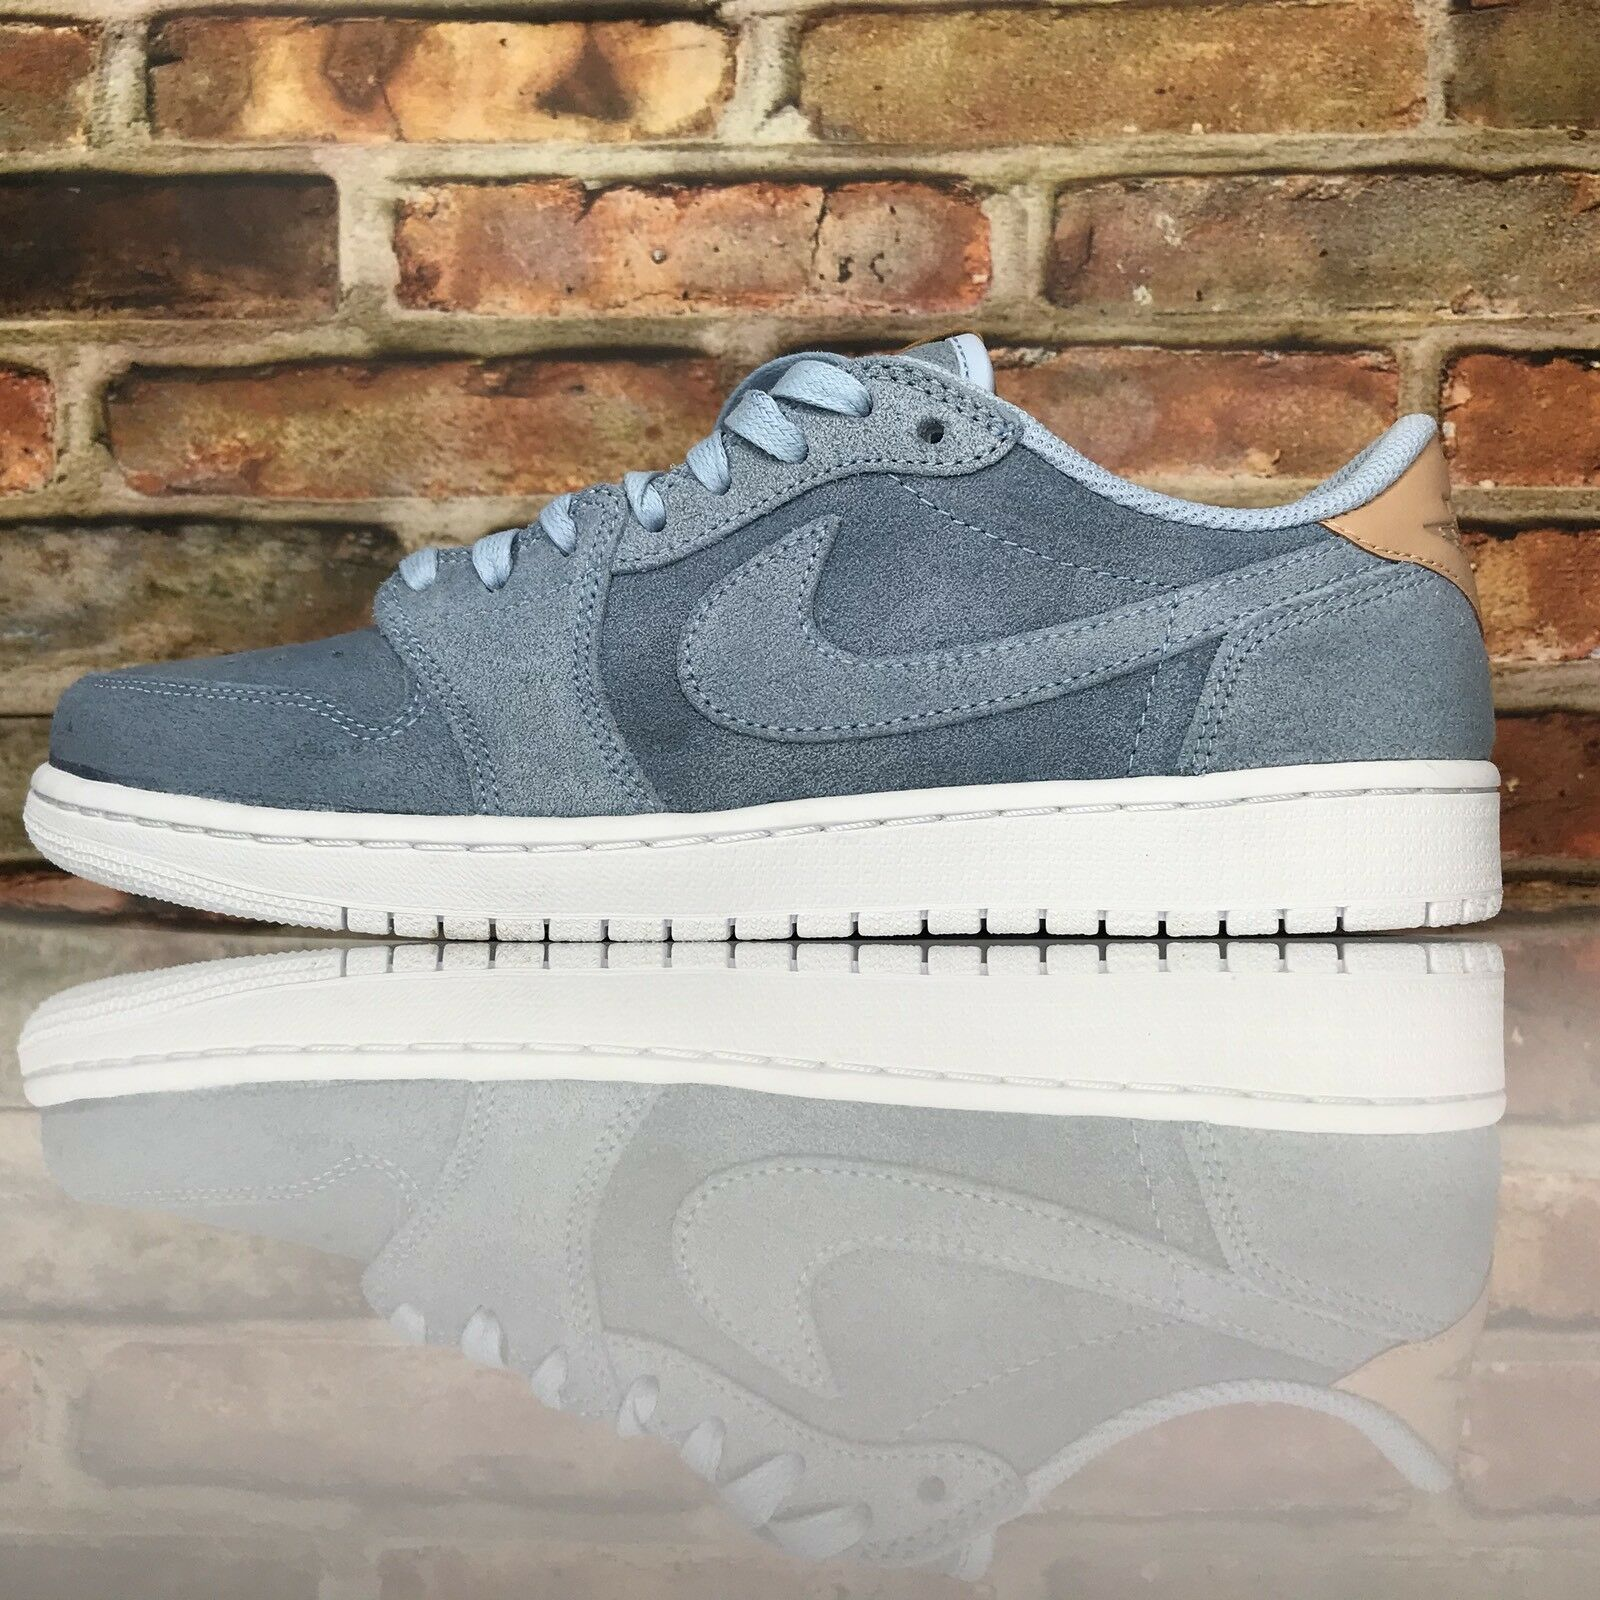 Air Jordan 1 Retro Low OG Premium Mens Size 10 Ice bluee Tan shoes 905136 403